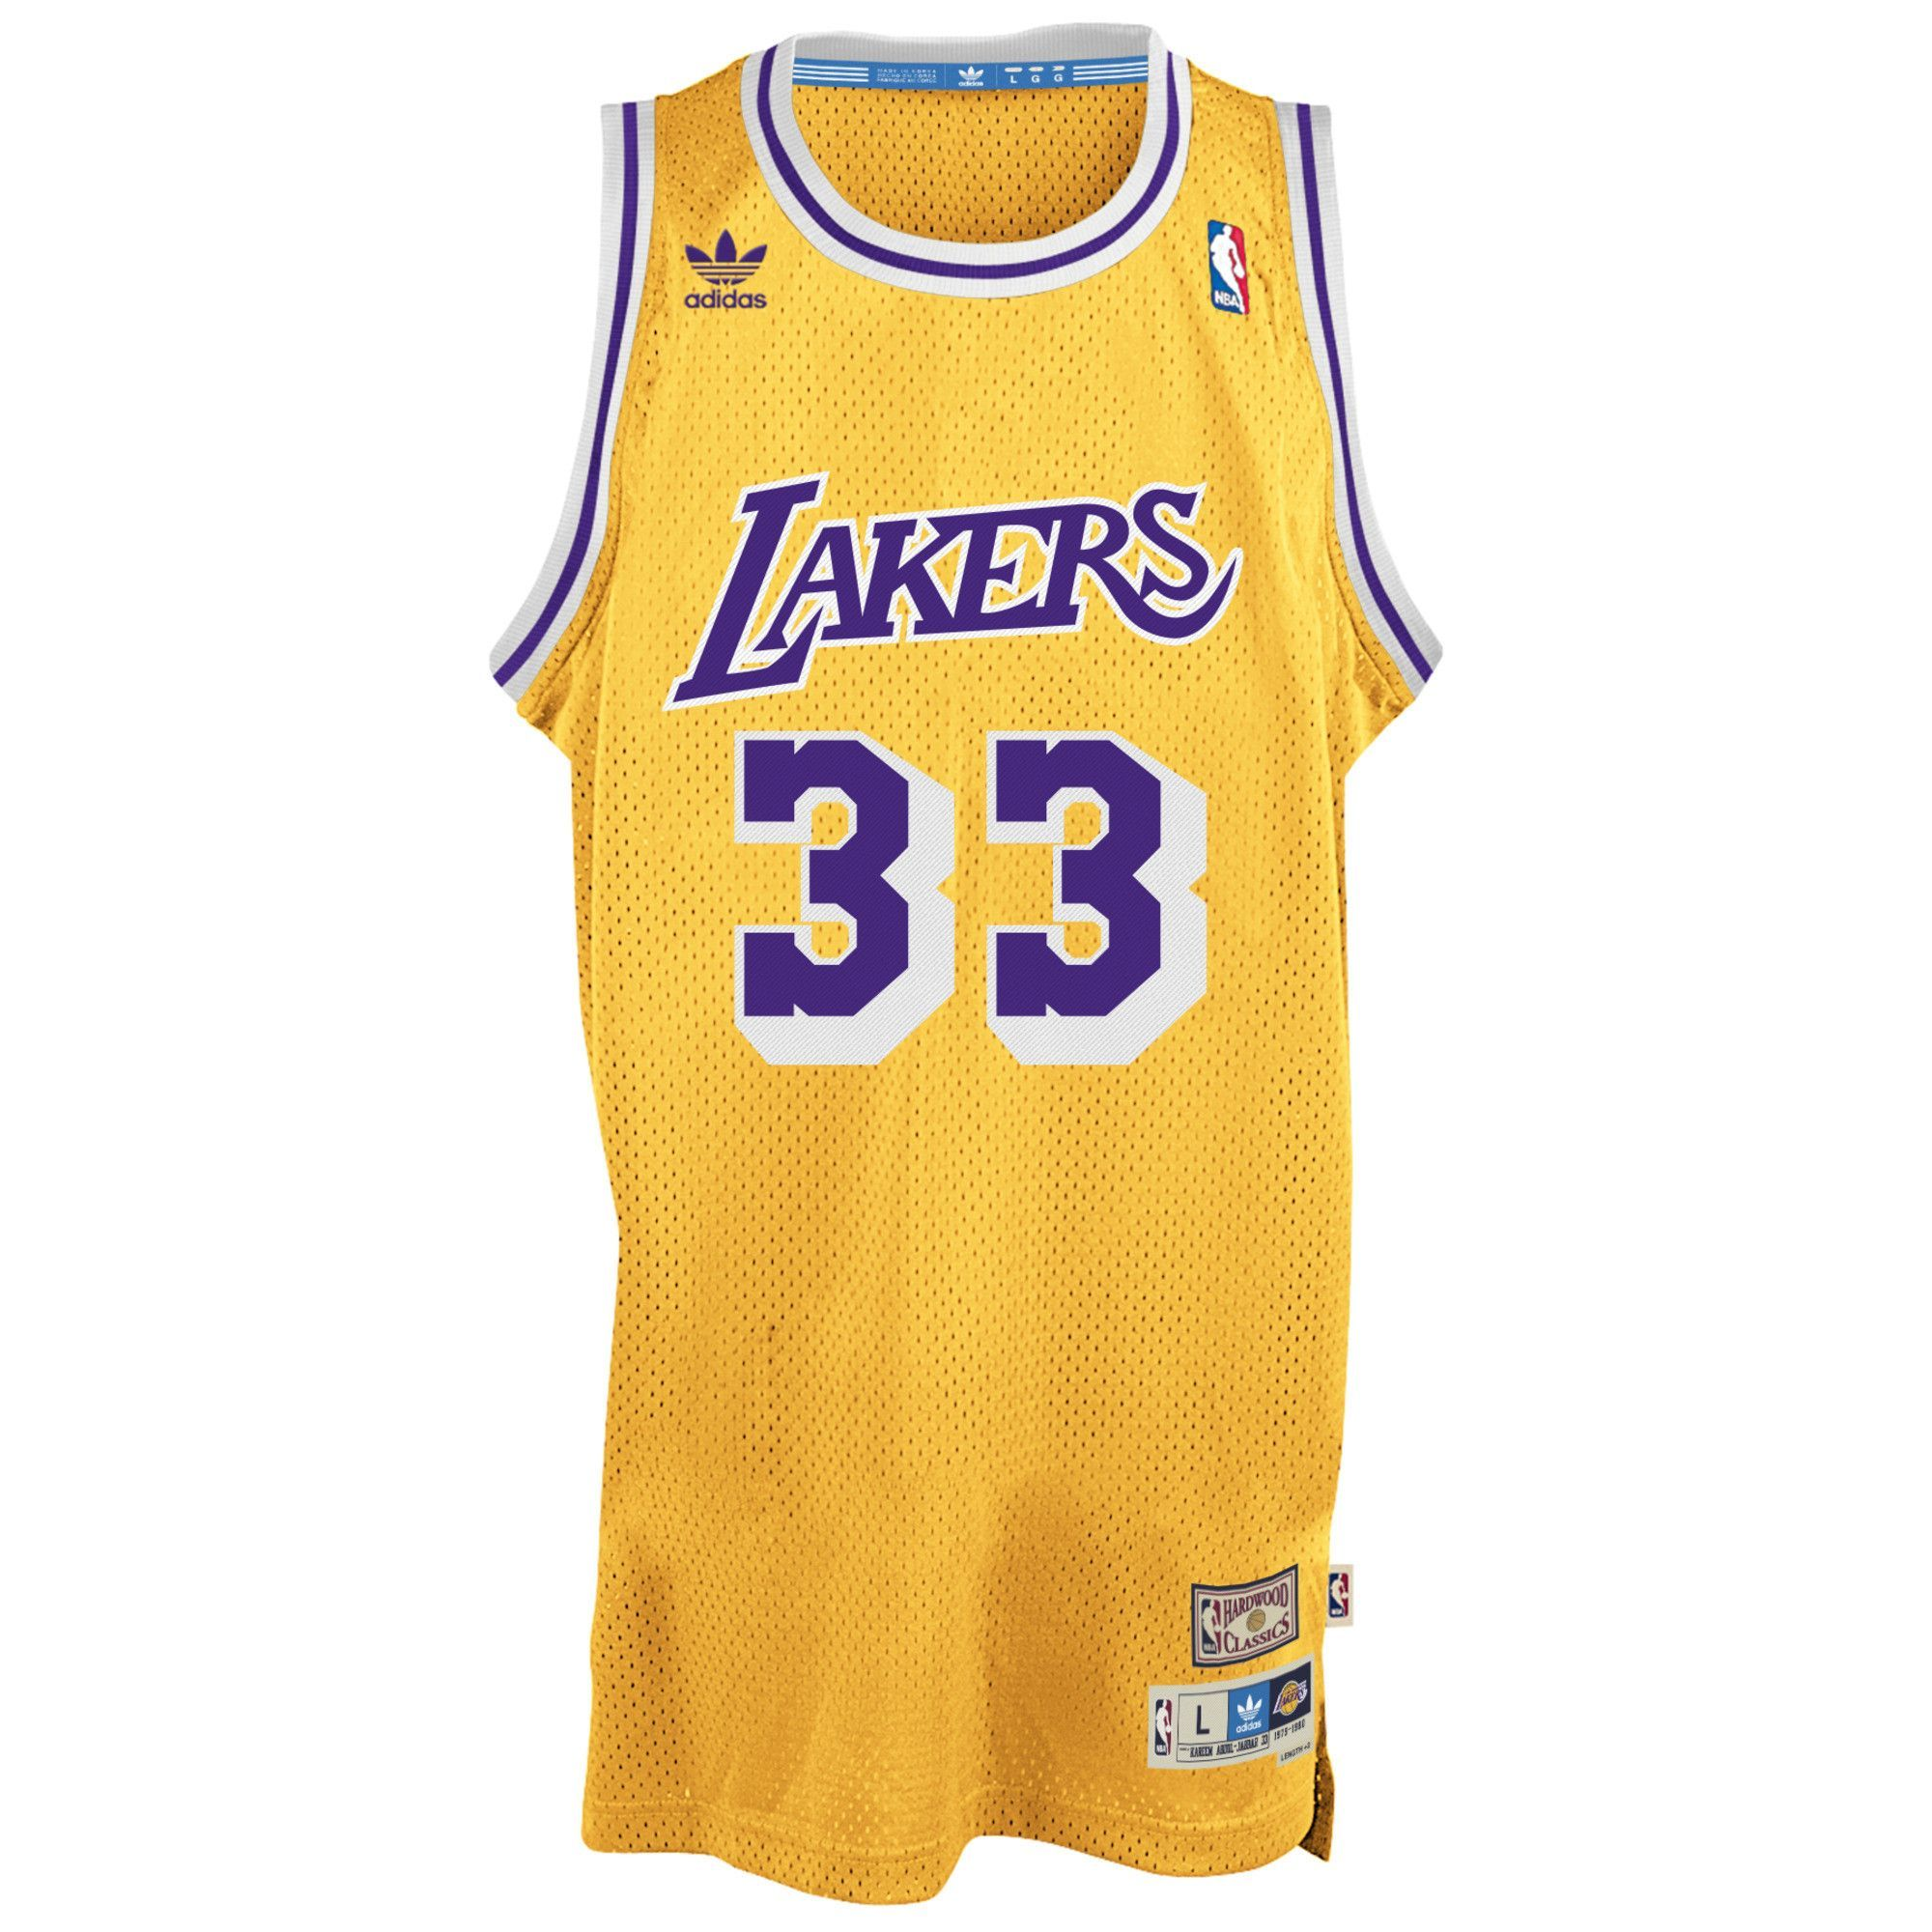 3b3ab7f4904 Men's Kareem Abdul-Jabbar Los Angeles Lakers Gold Hardwood Classic Swingman  Jersey by adidas. Pro Image Sports at Mall of America.